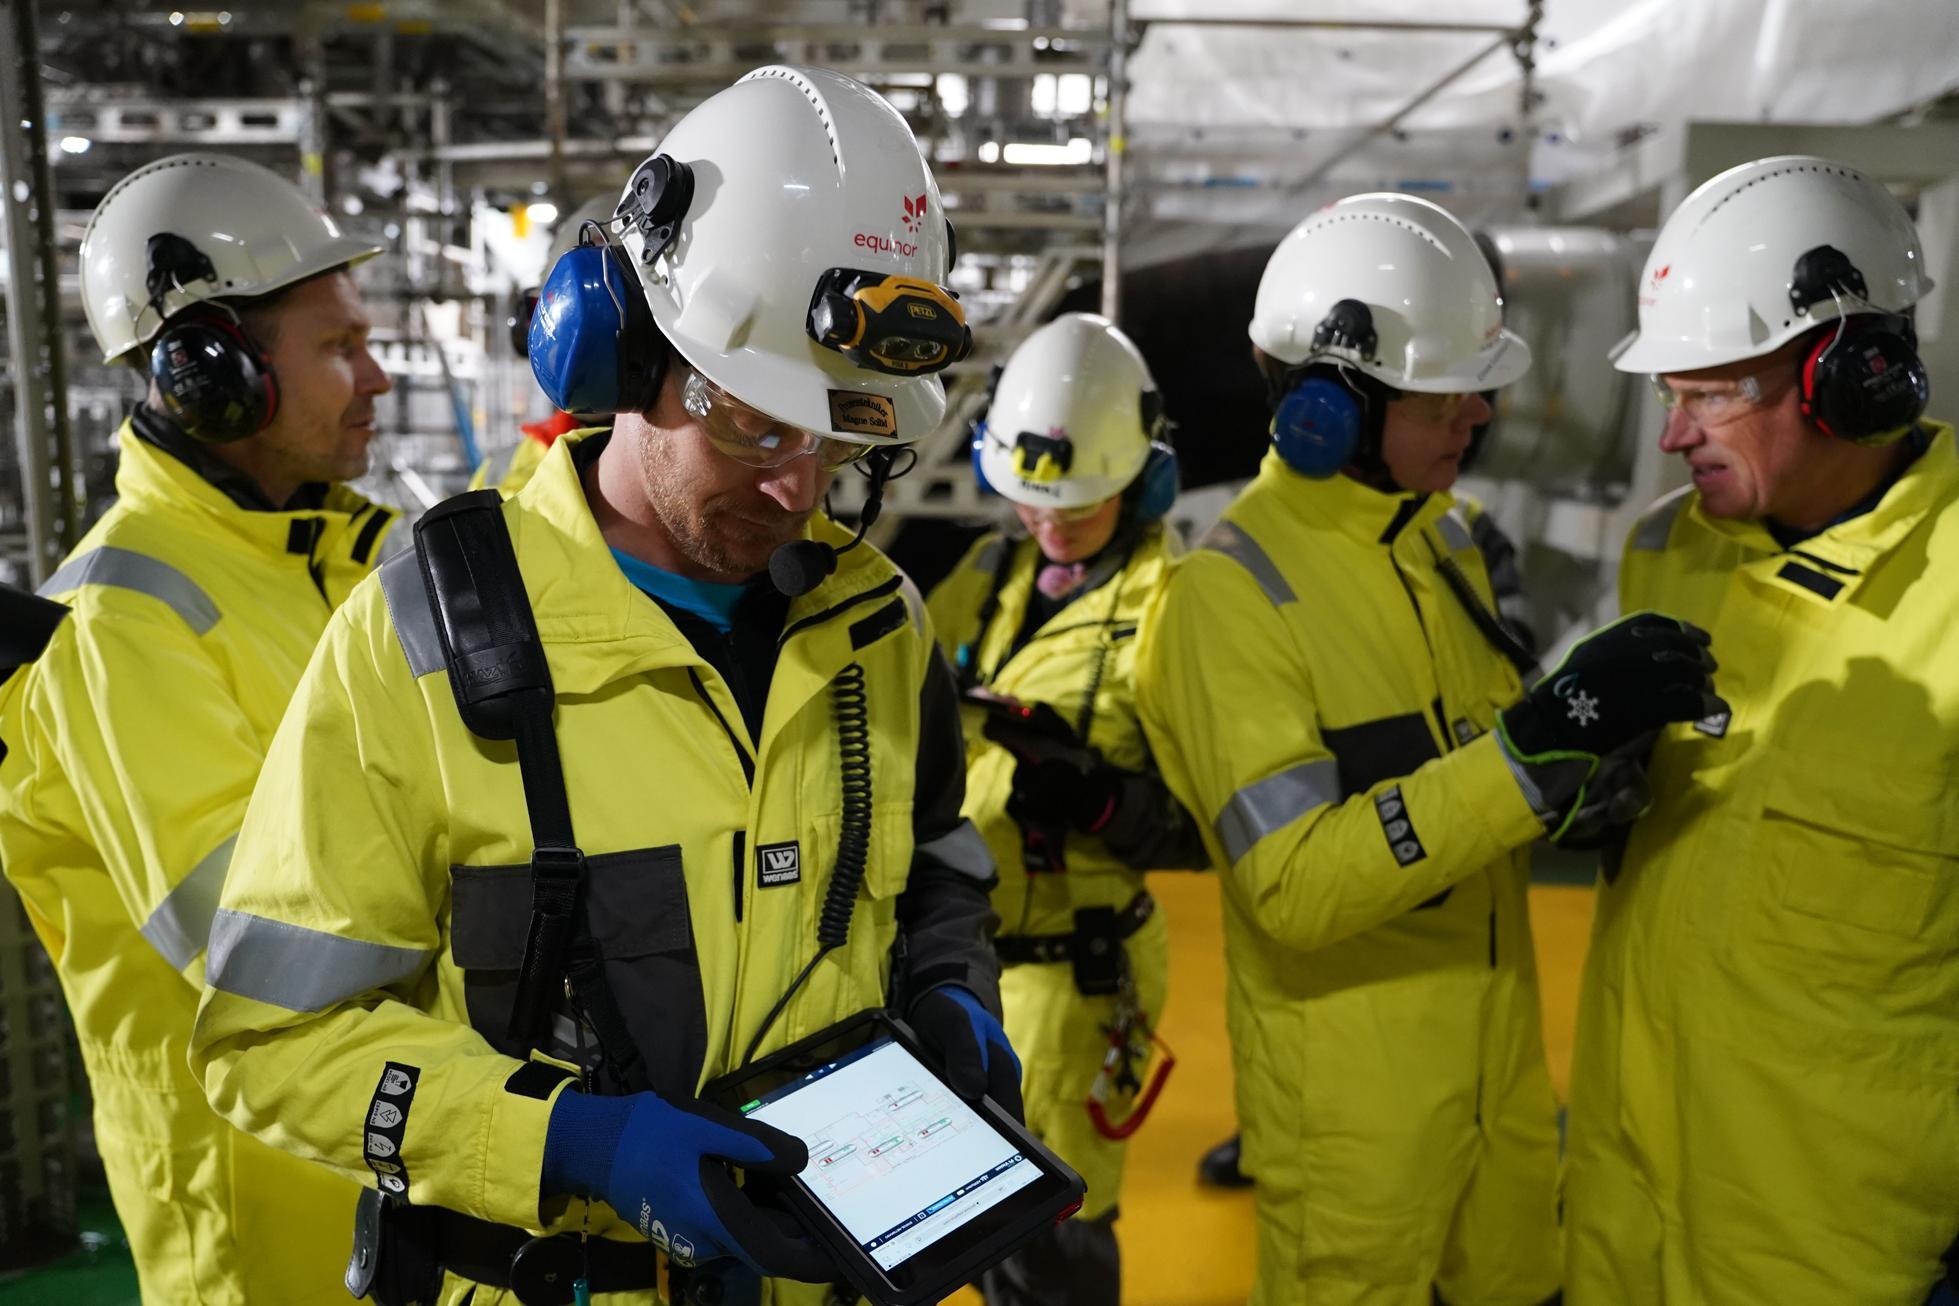 NORWAY-ENVIRONMENT-CLIMATE-ECONOMY-ENERGY-OIL